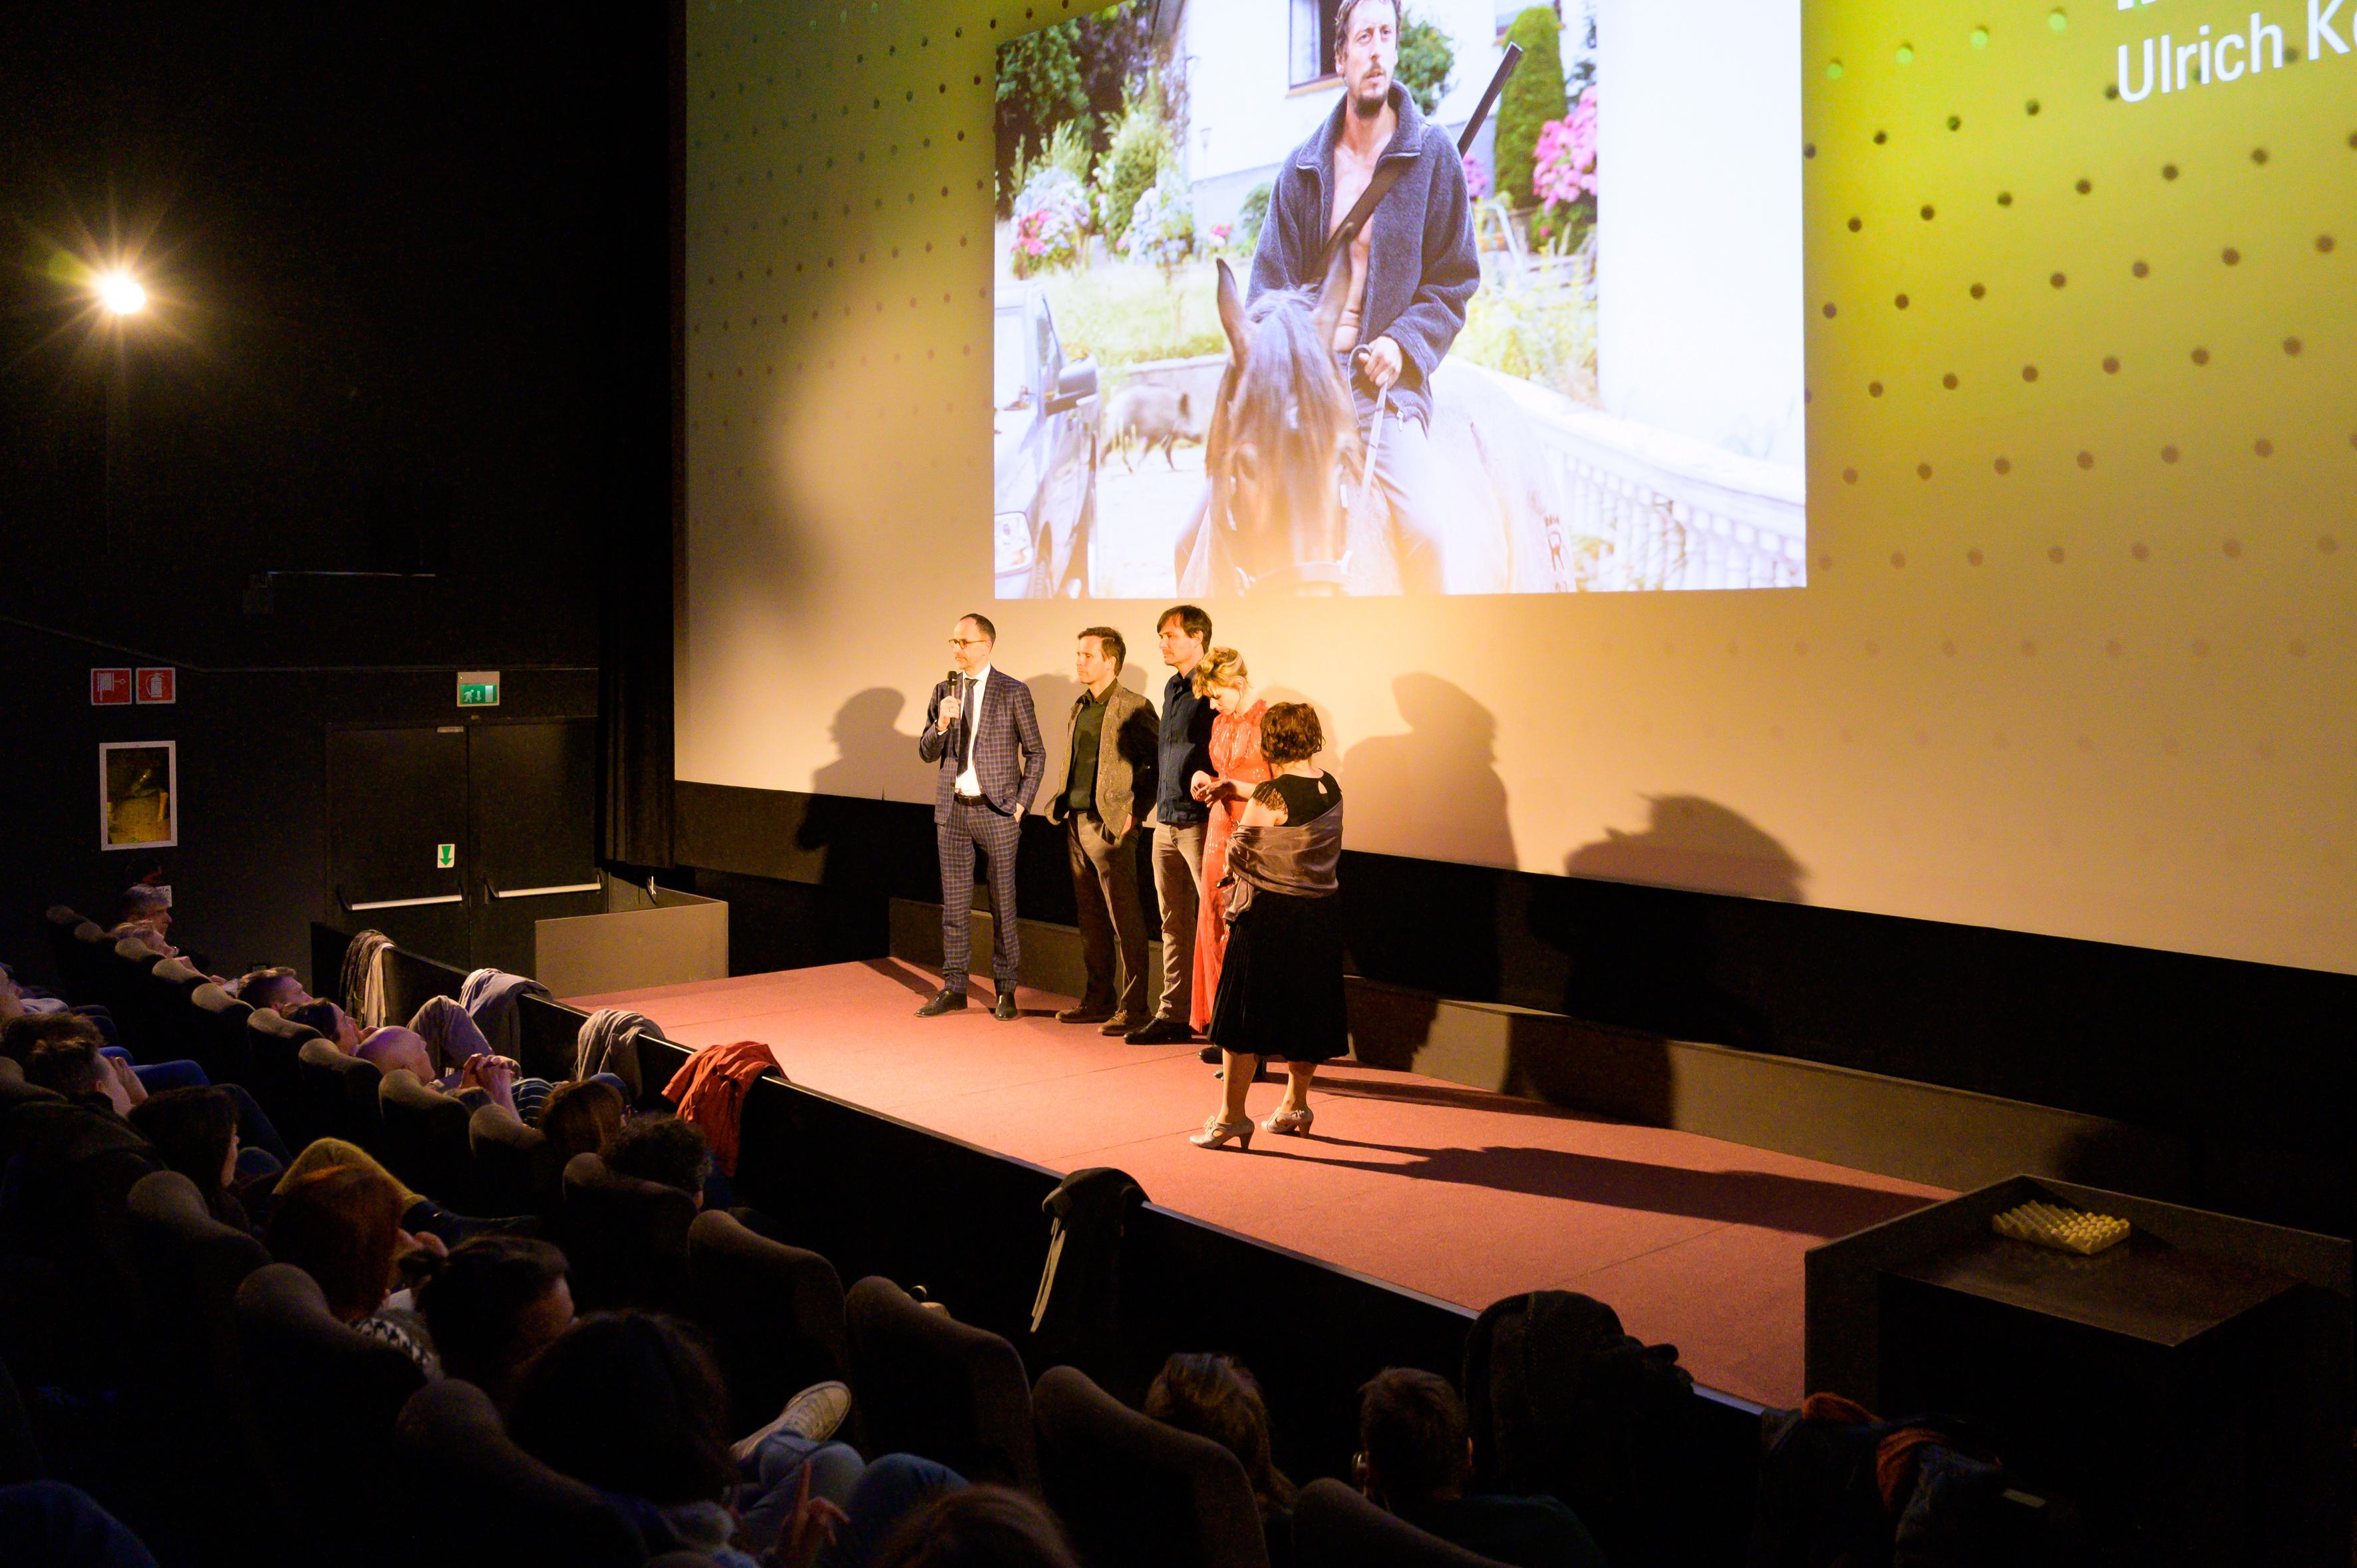 bolzano-film-festival-bozen